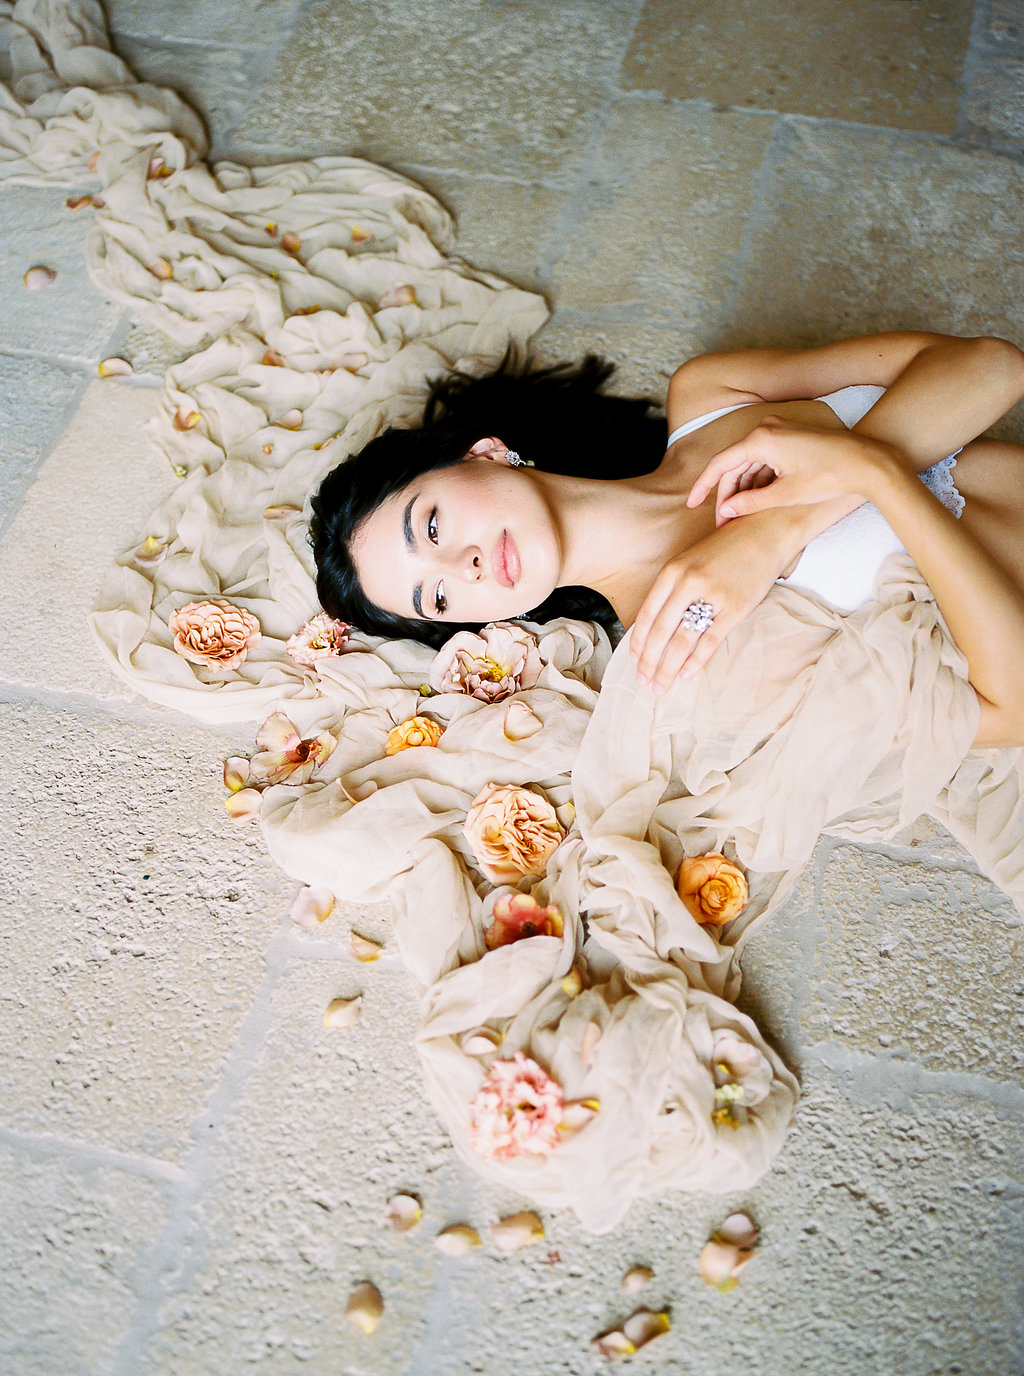 Paso Robles California - Allegretto Resort and Vineyards - Boudoir - fine art film photographer Tanja Kibogo2.JPG